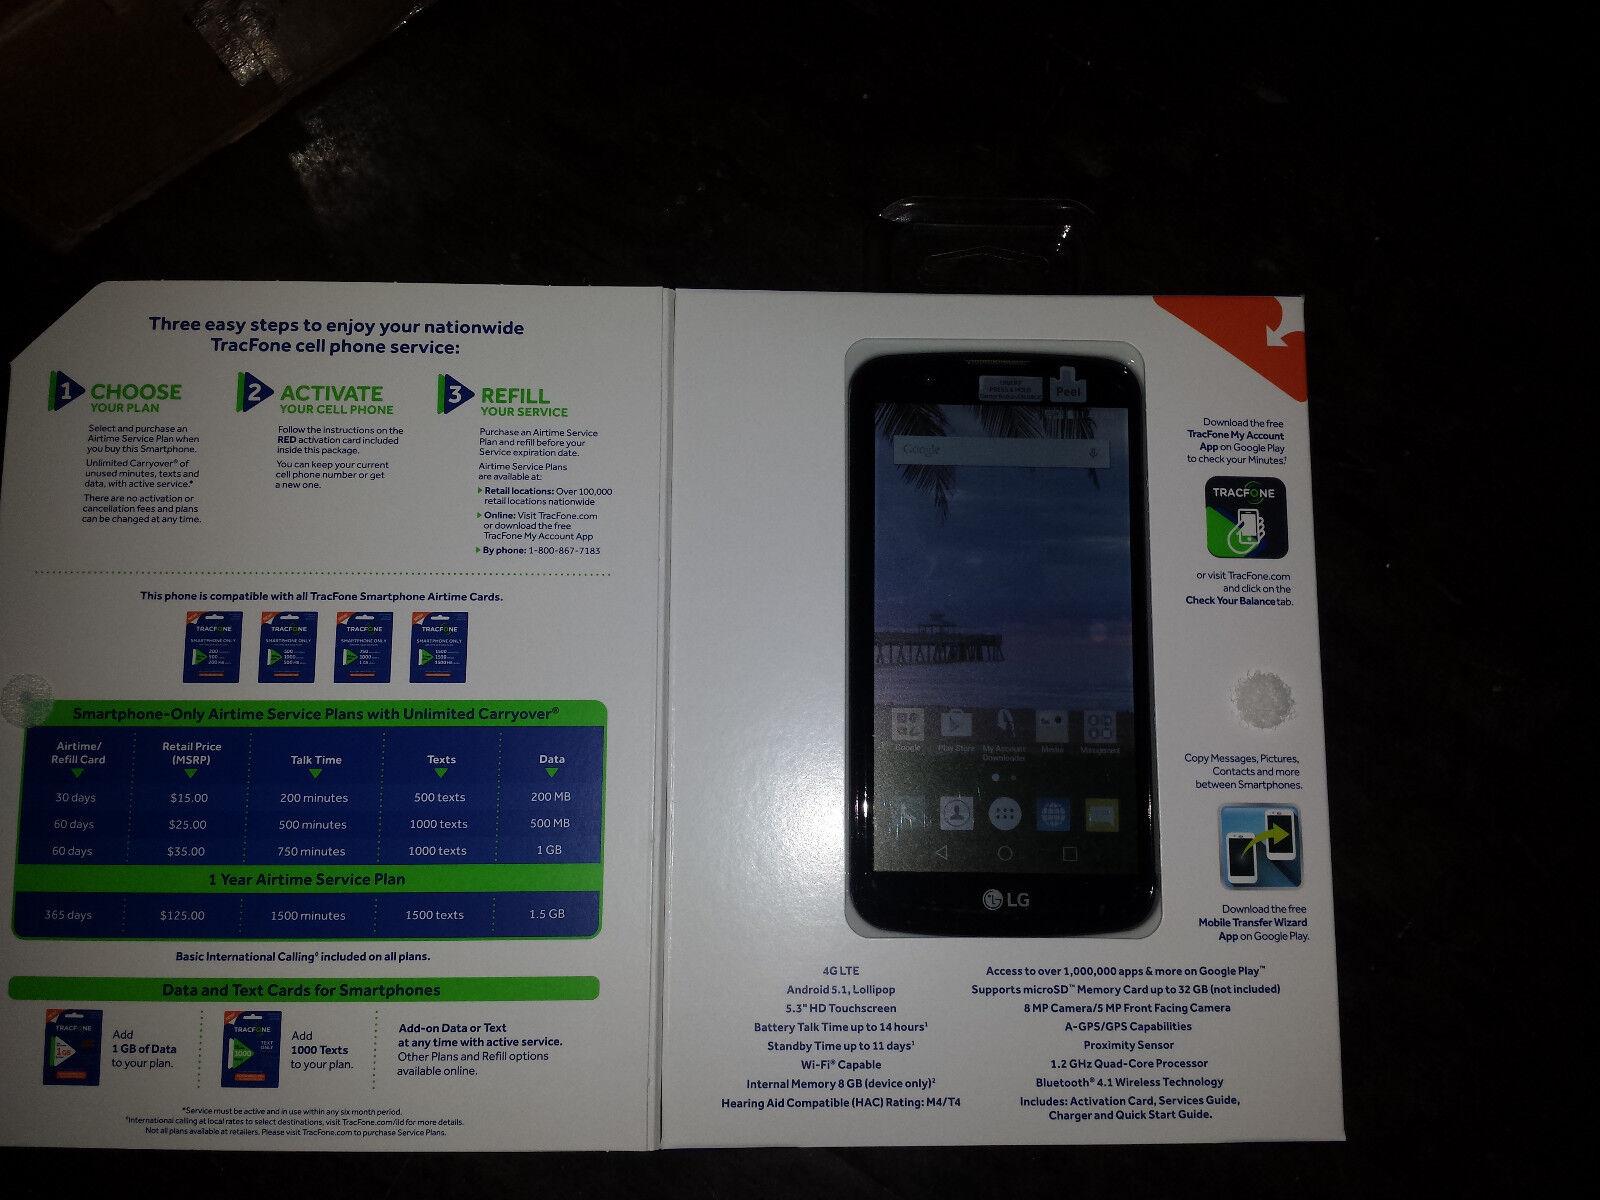 LG Premier LTE Tracfone Prepaid Android Smartphone